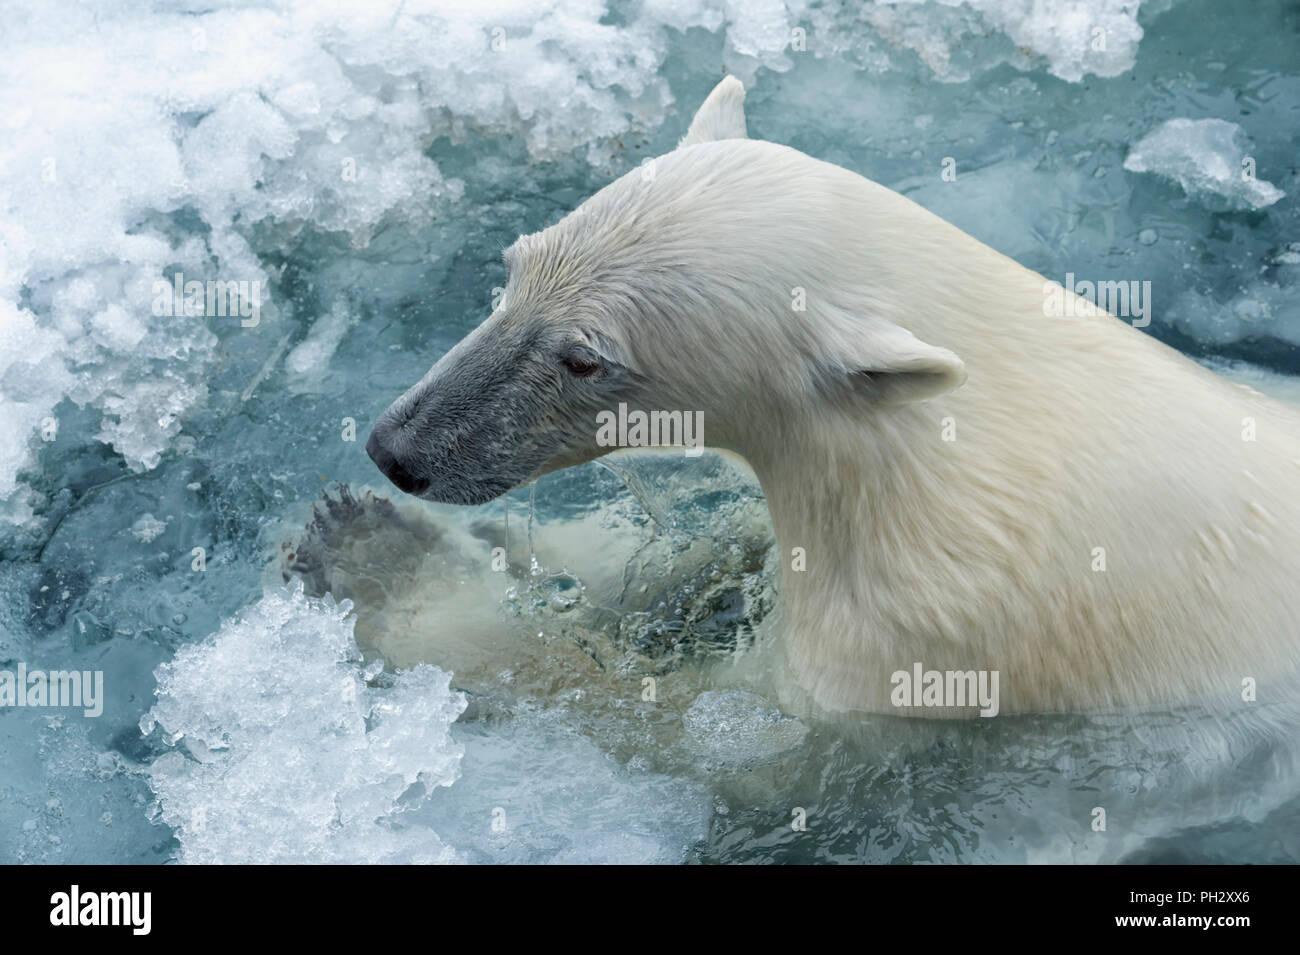 Polar Bear (Ursus maritimus) swimming through pack ice, Svalbard Archipelago, Norway - Stock Image